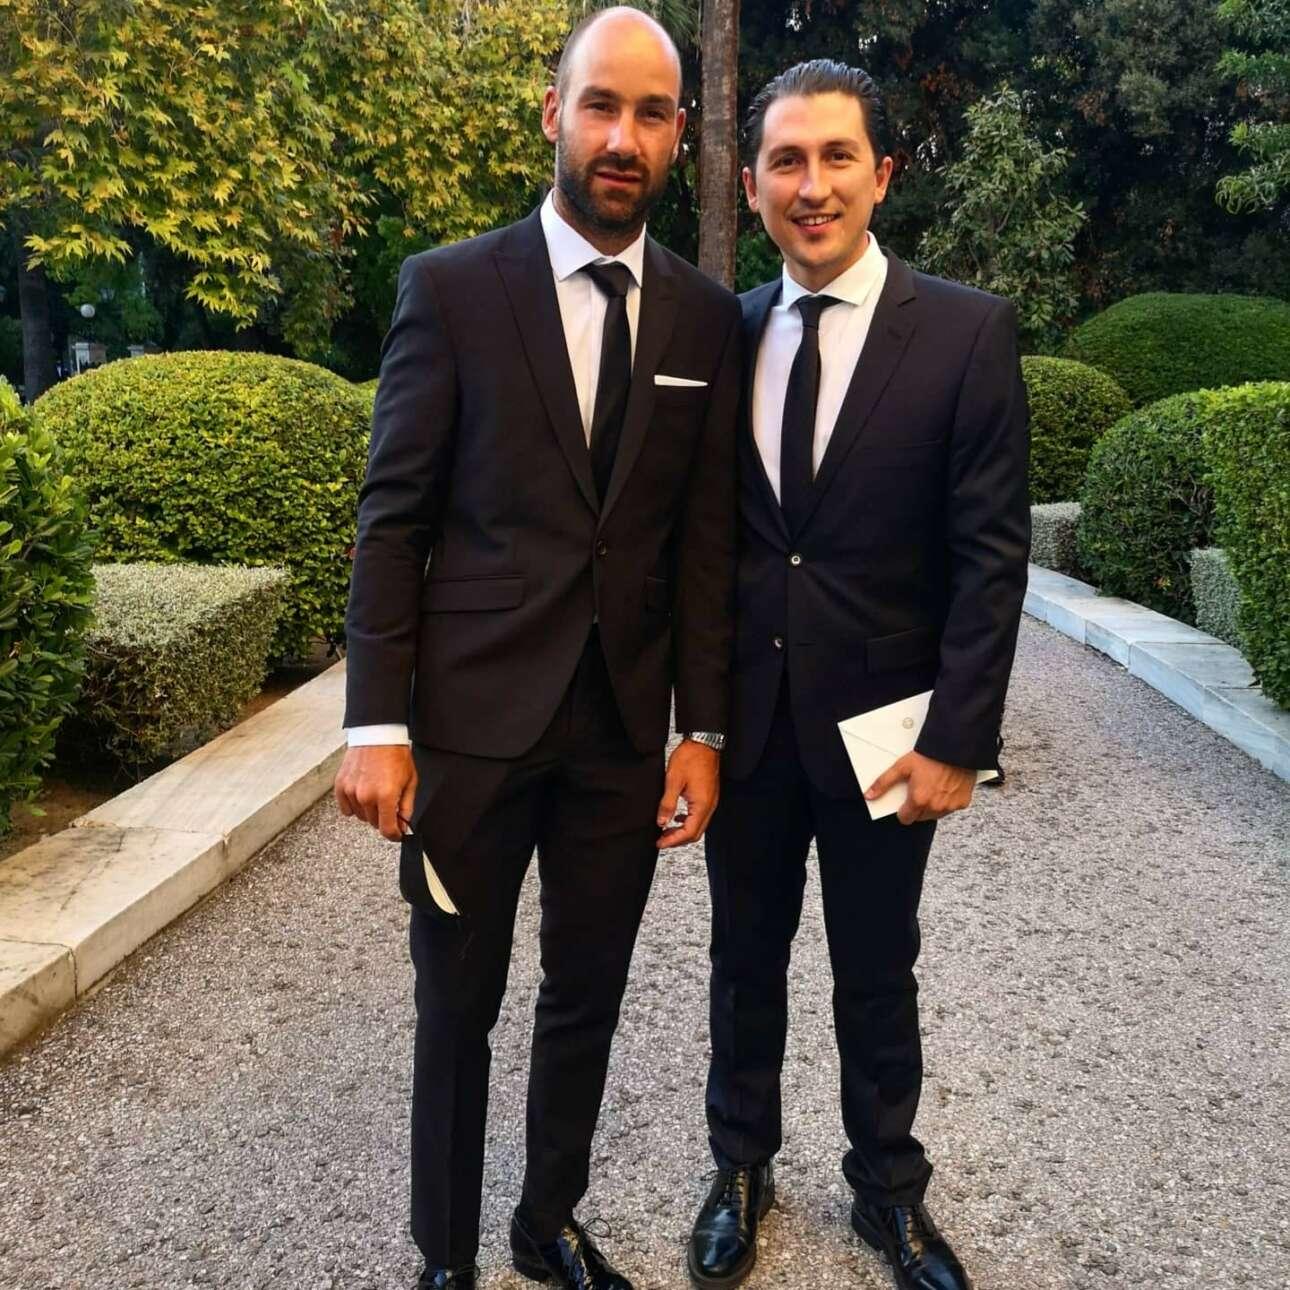 O σπουδαίος του ελληνικού μπάσκετ Βασίλης Σπανούλης με τον εκπρόσωπο Τύπου του Κινήματος Αλλαγής Παύλο Χρηστίδη